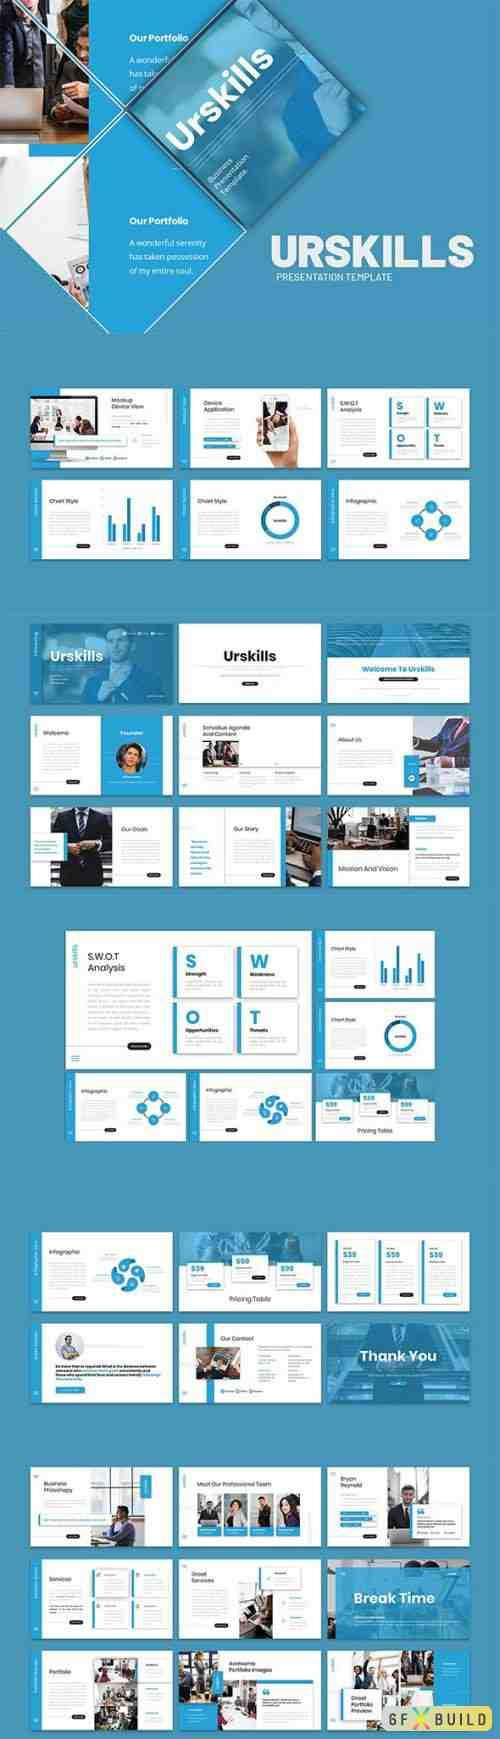 Urskills - Business Presentation Keynote Template